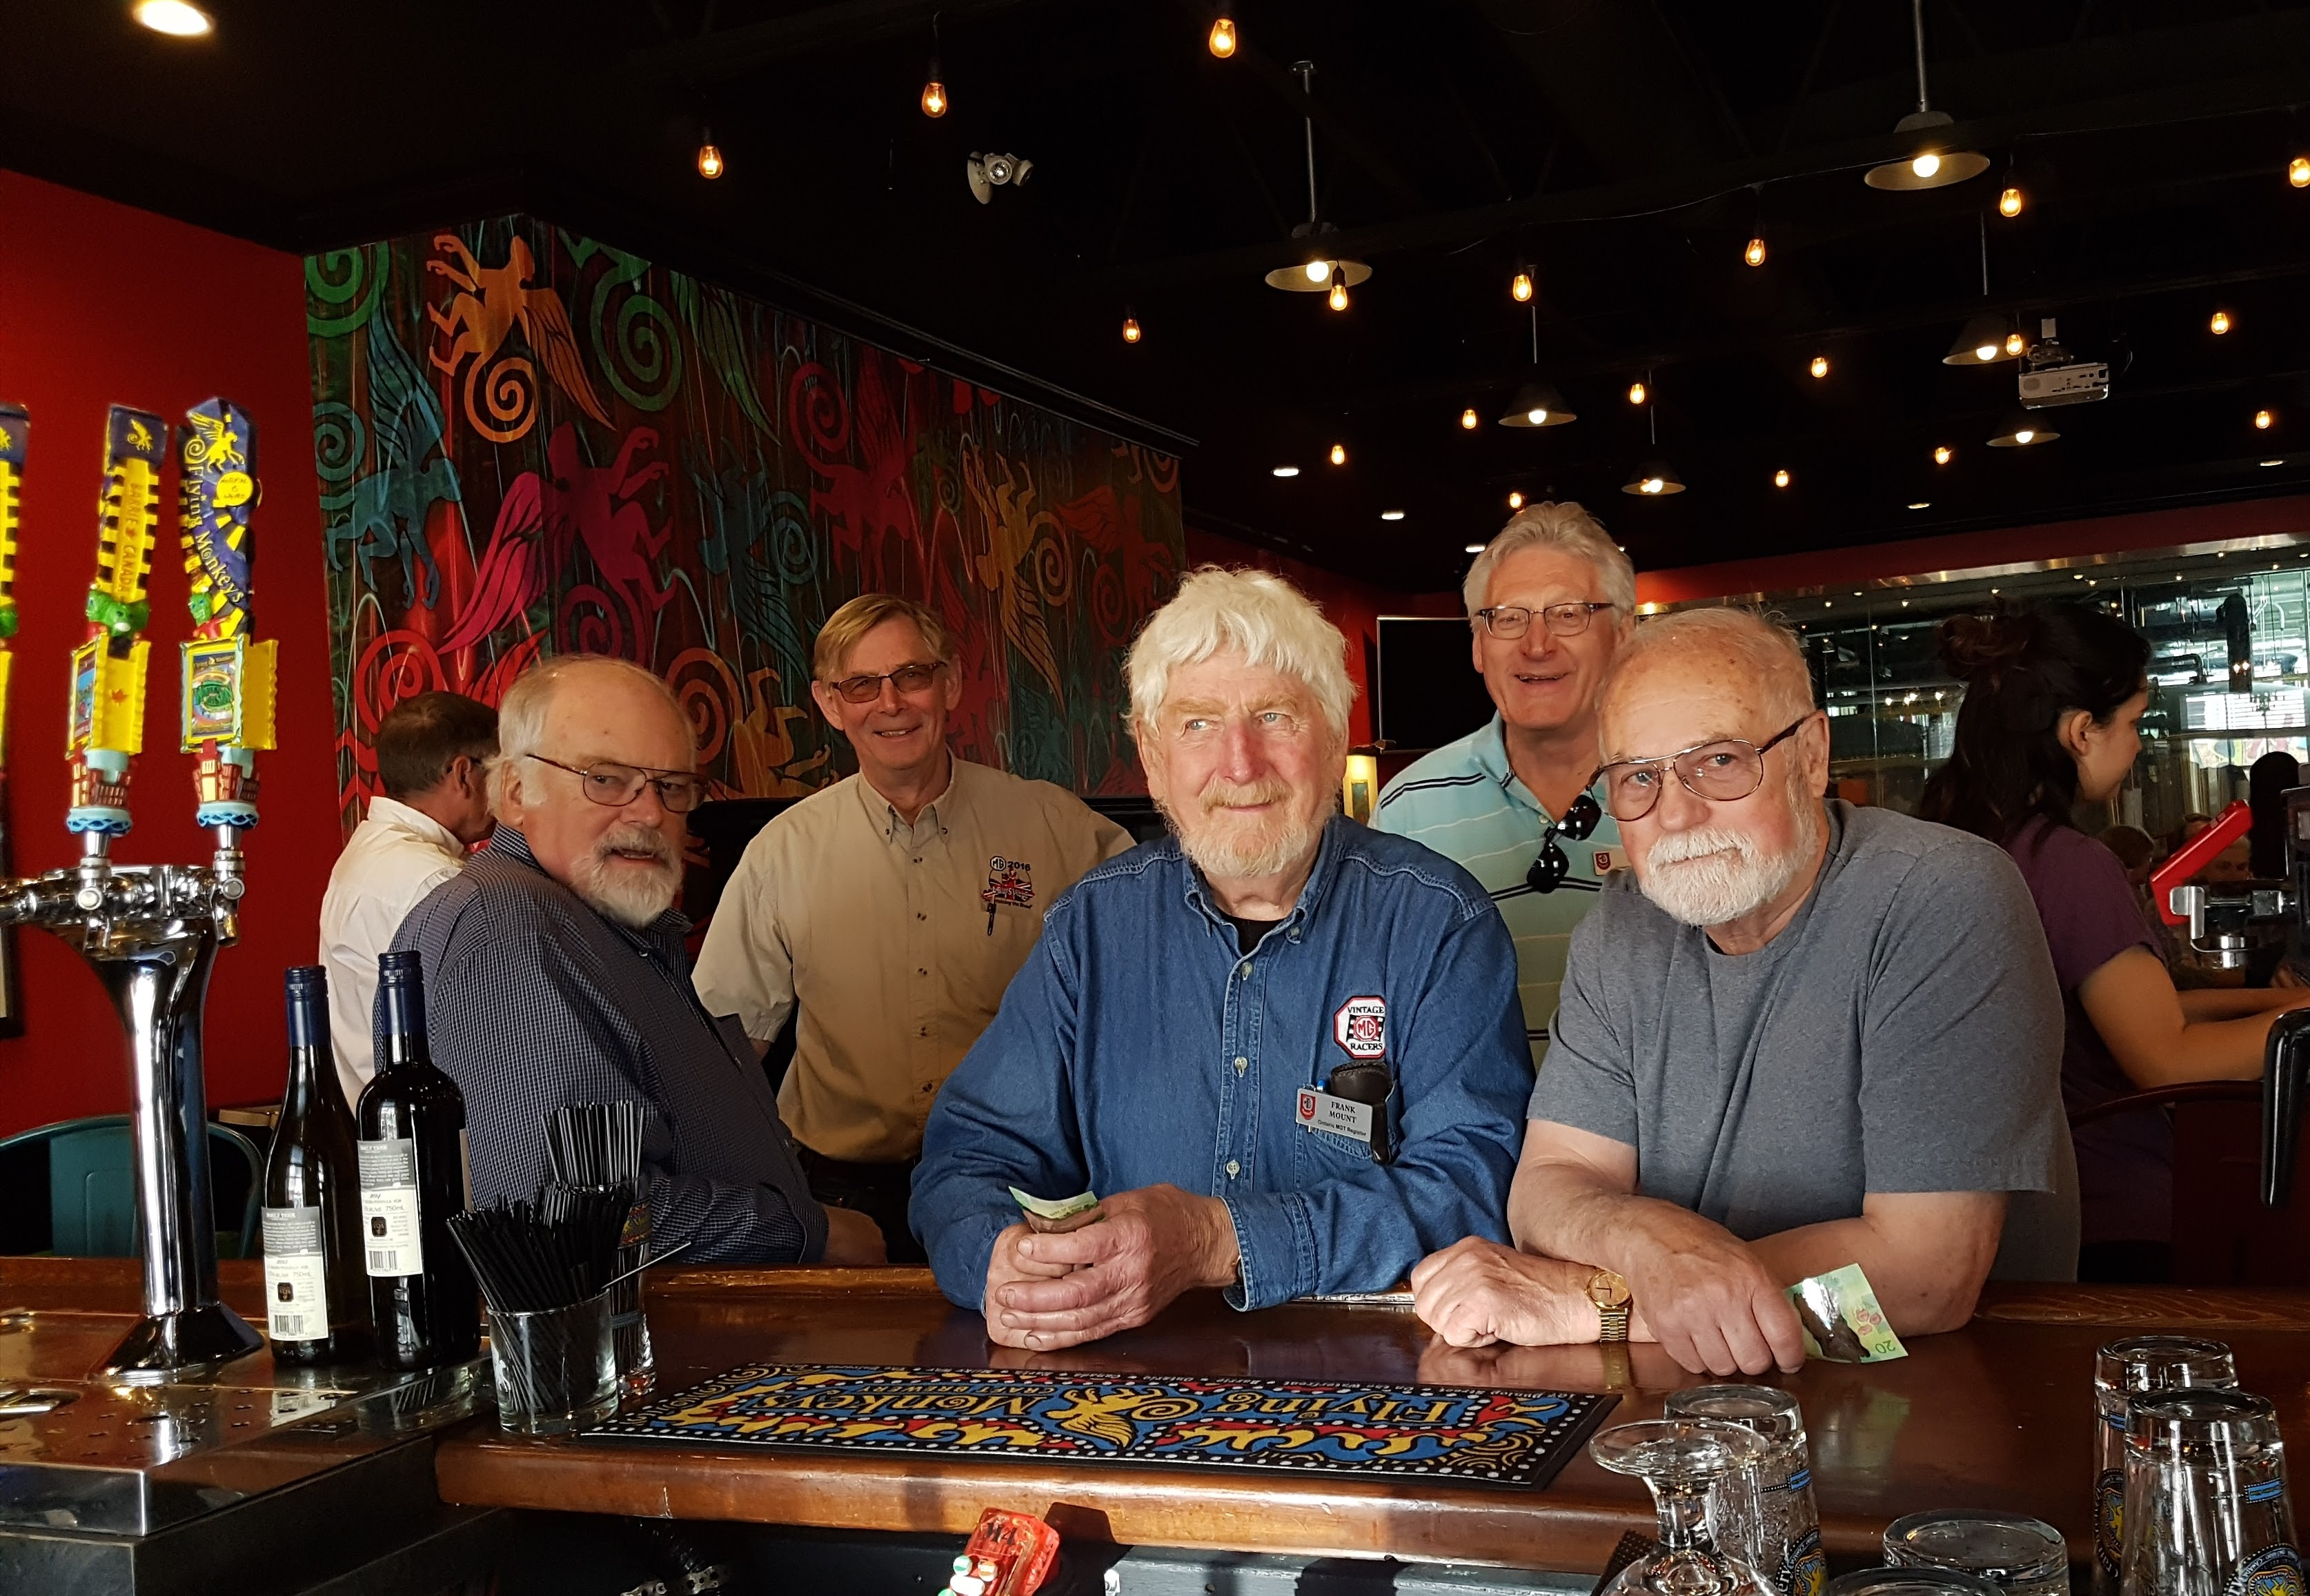 Guys at Flying Monkeys bar